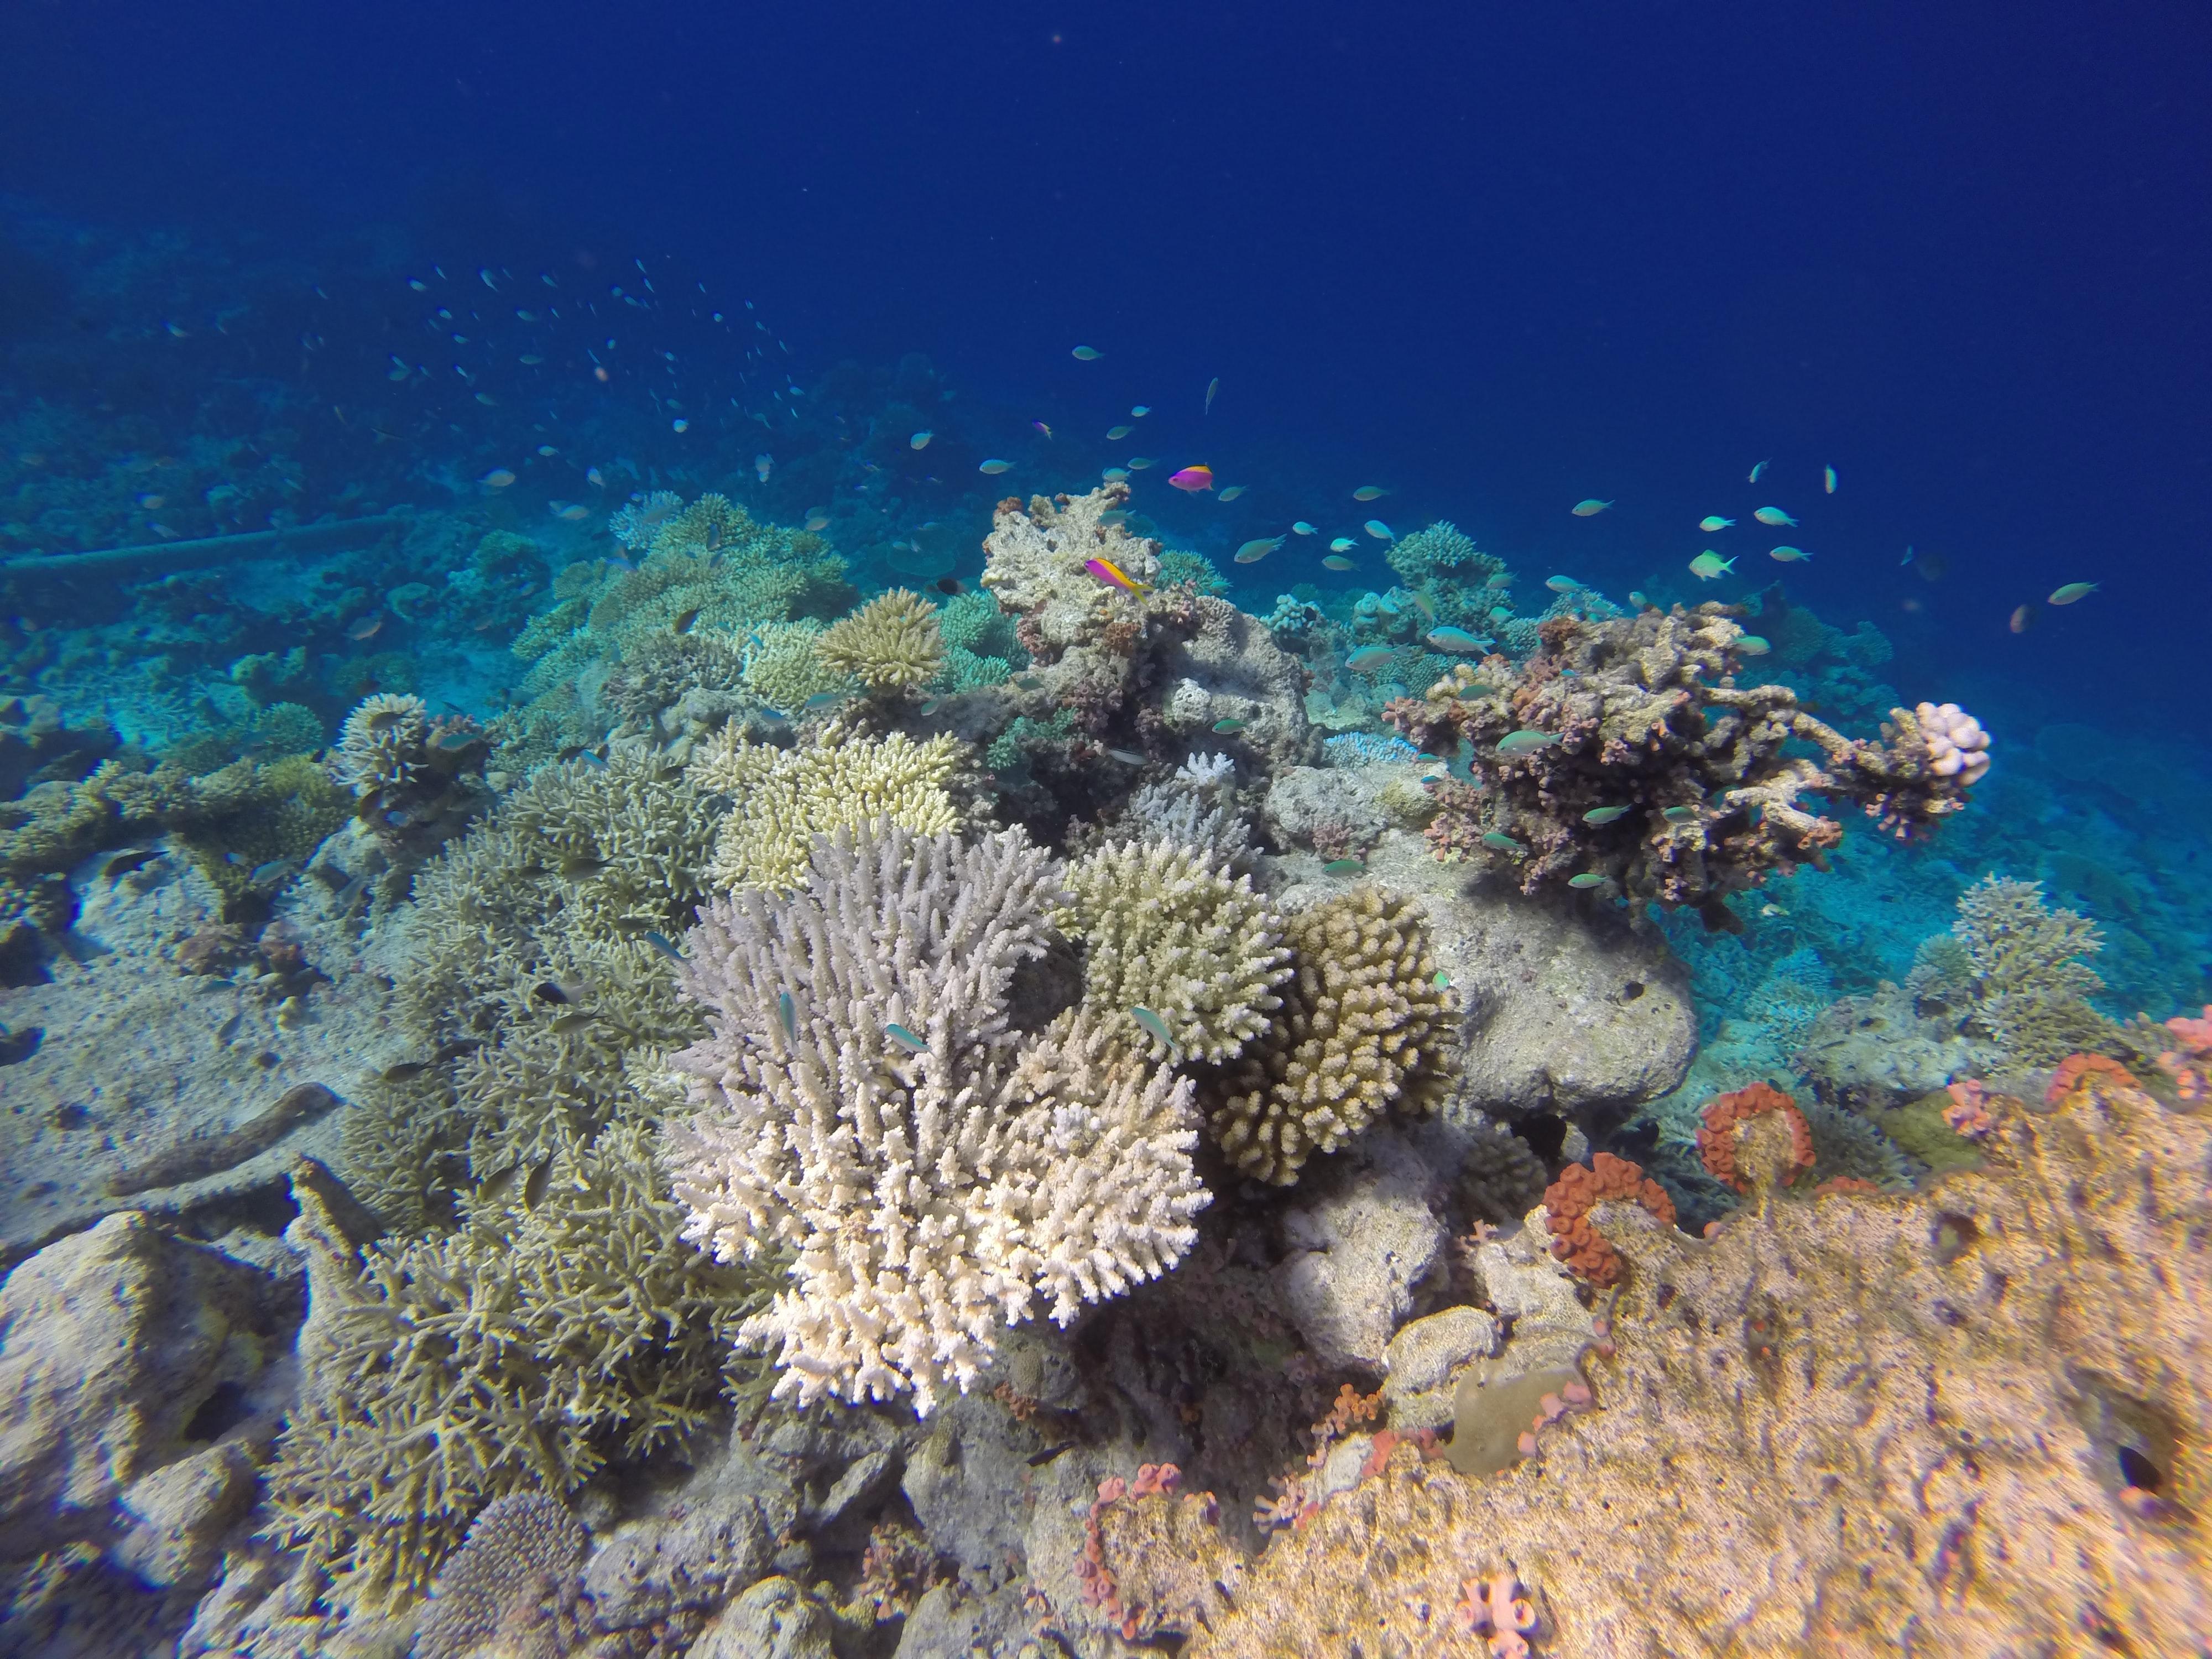 Colorful corals of the Maldives